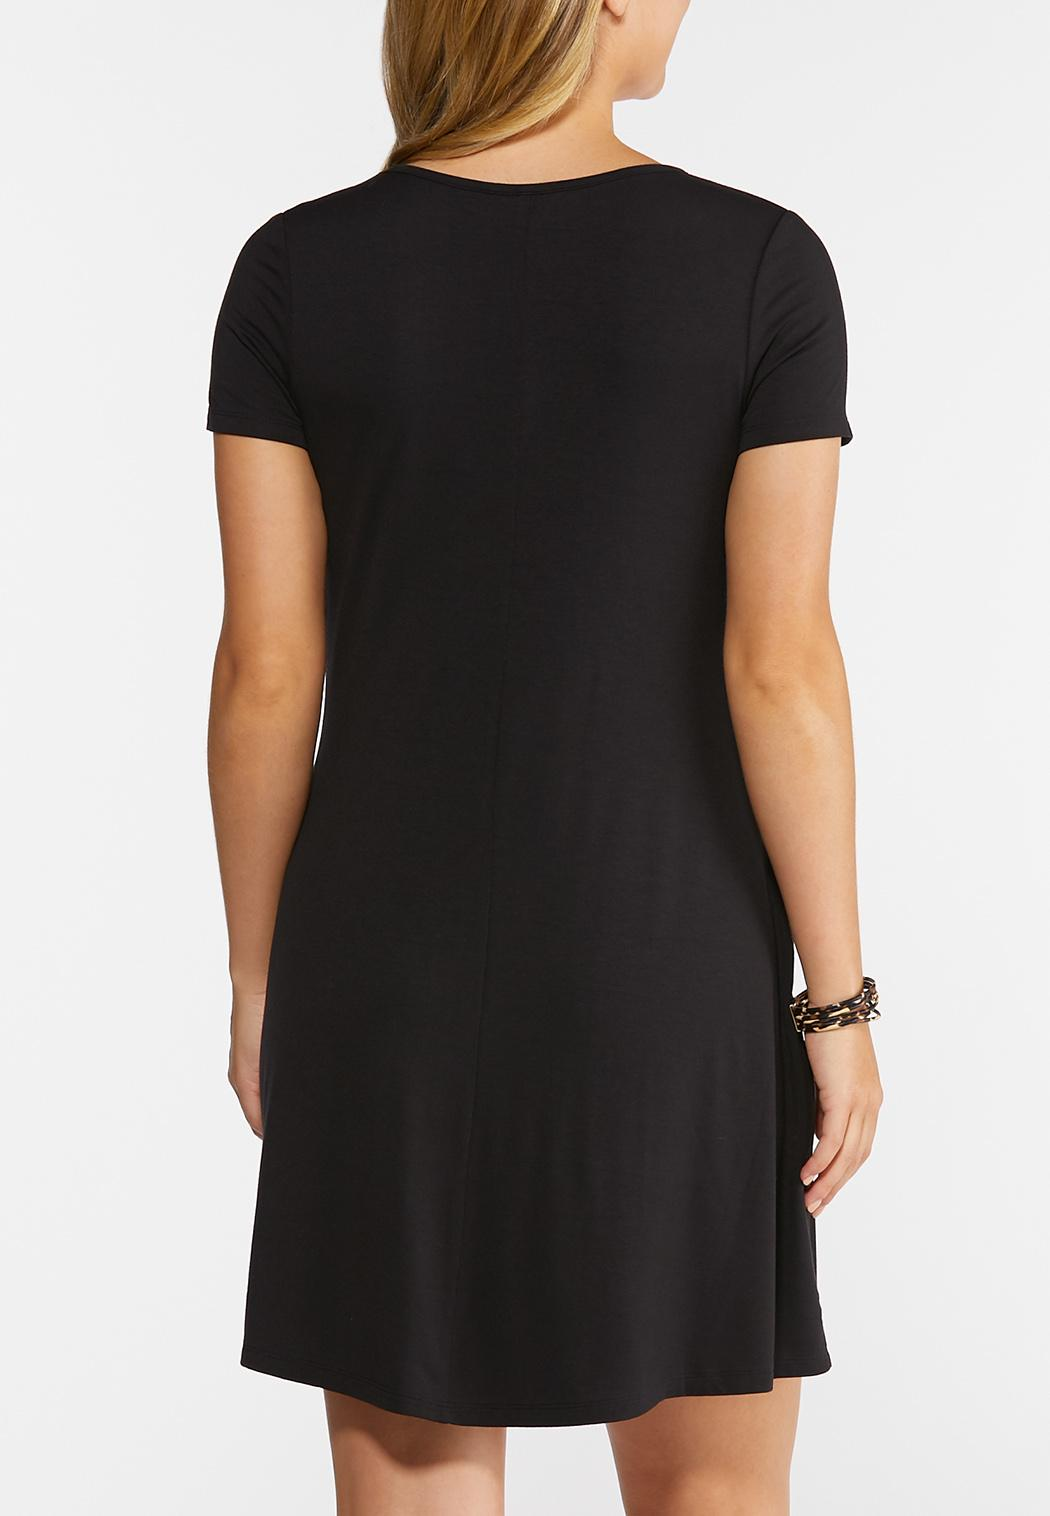 Ruffled Pocket Shirt Dress (Item #44295141)